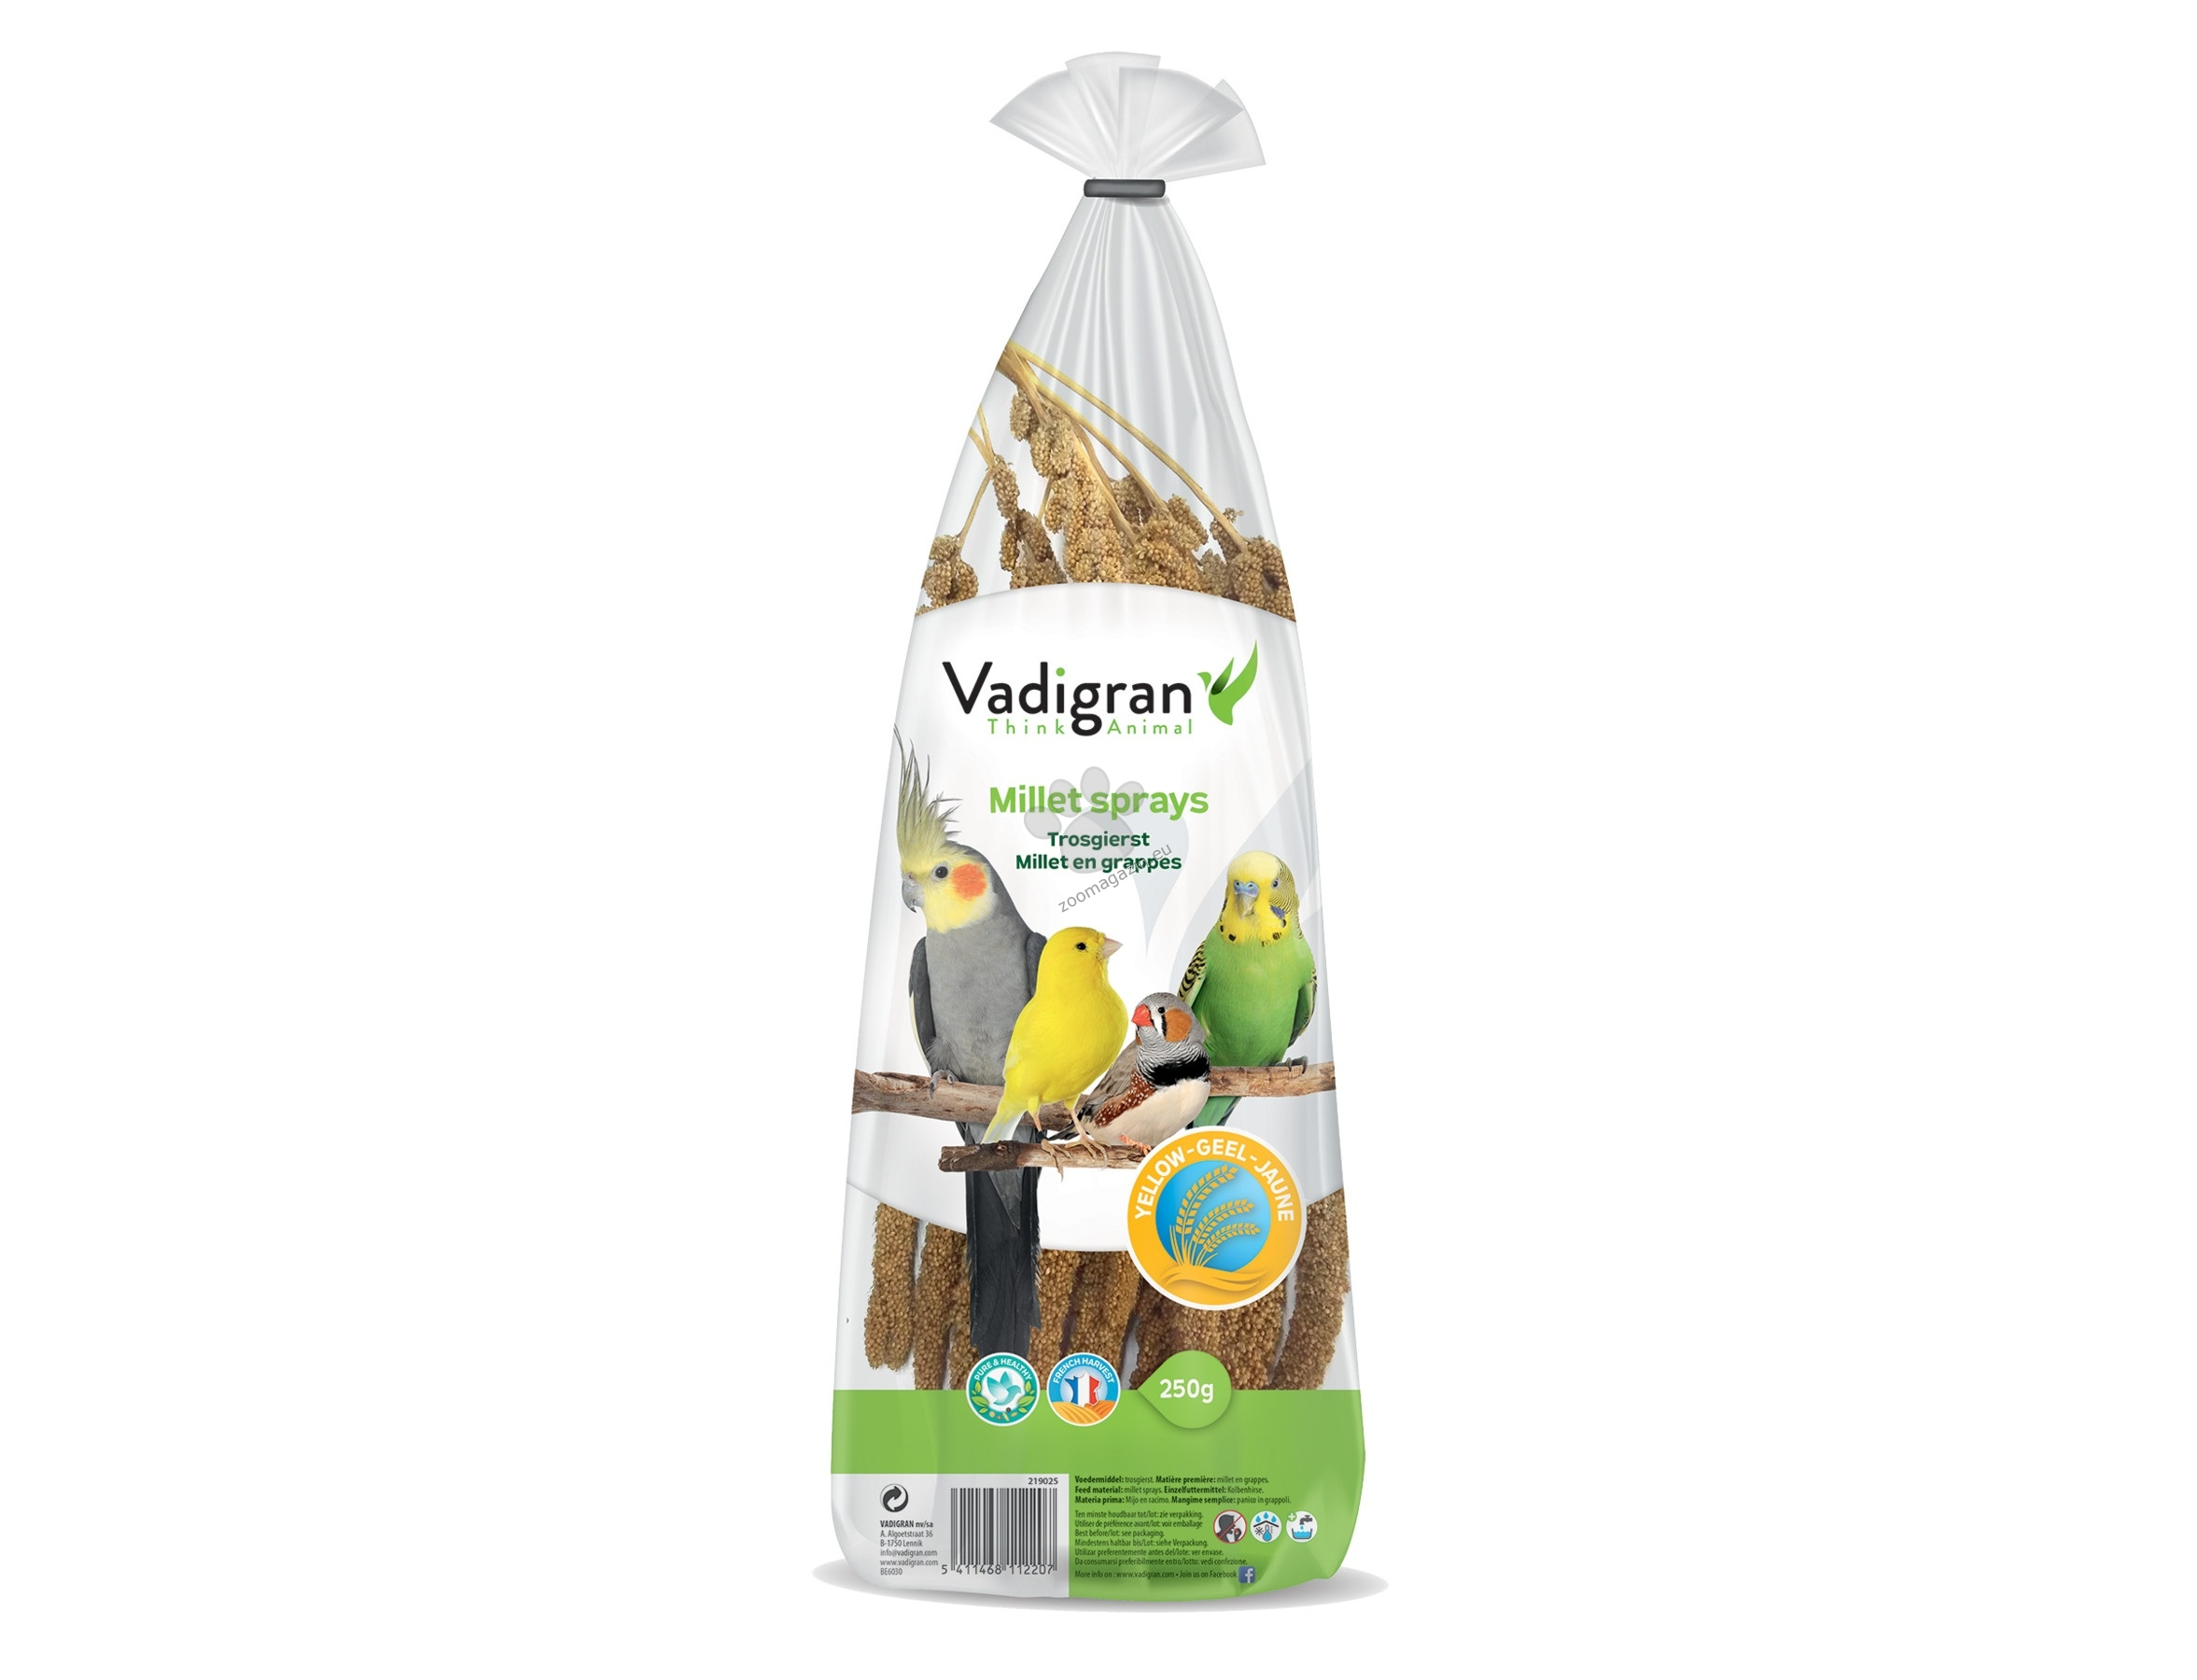 Vadigran - French Yellow Millet Sprays - френско жълто просо 250 гр.